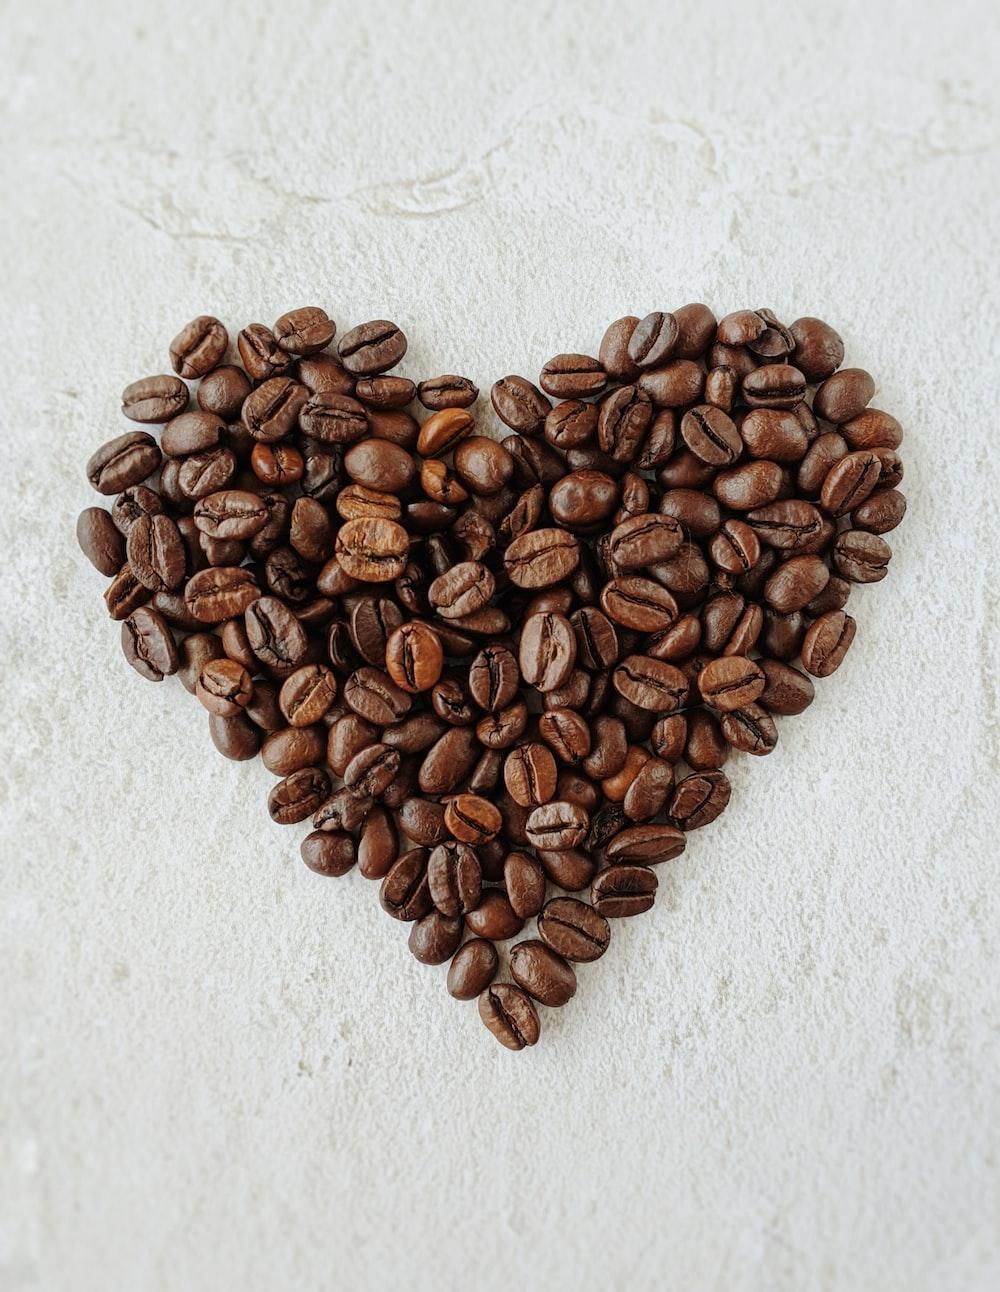 brown coffee beans on white textile